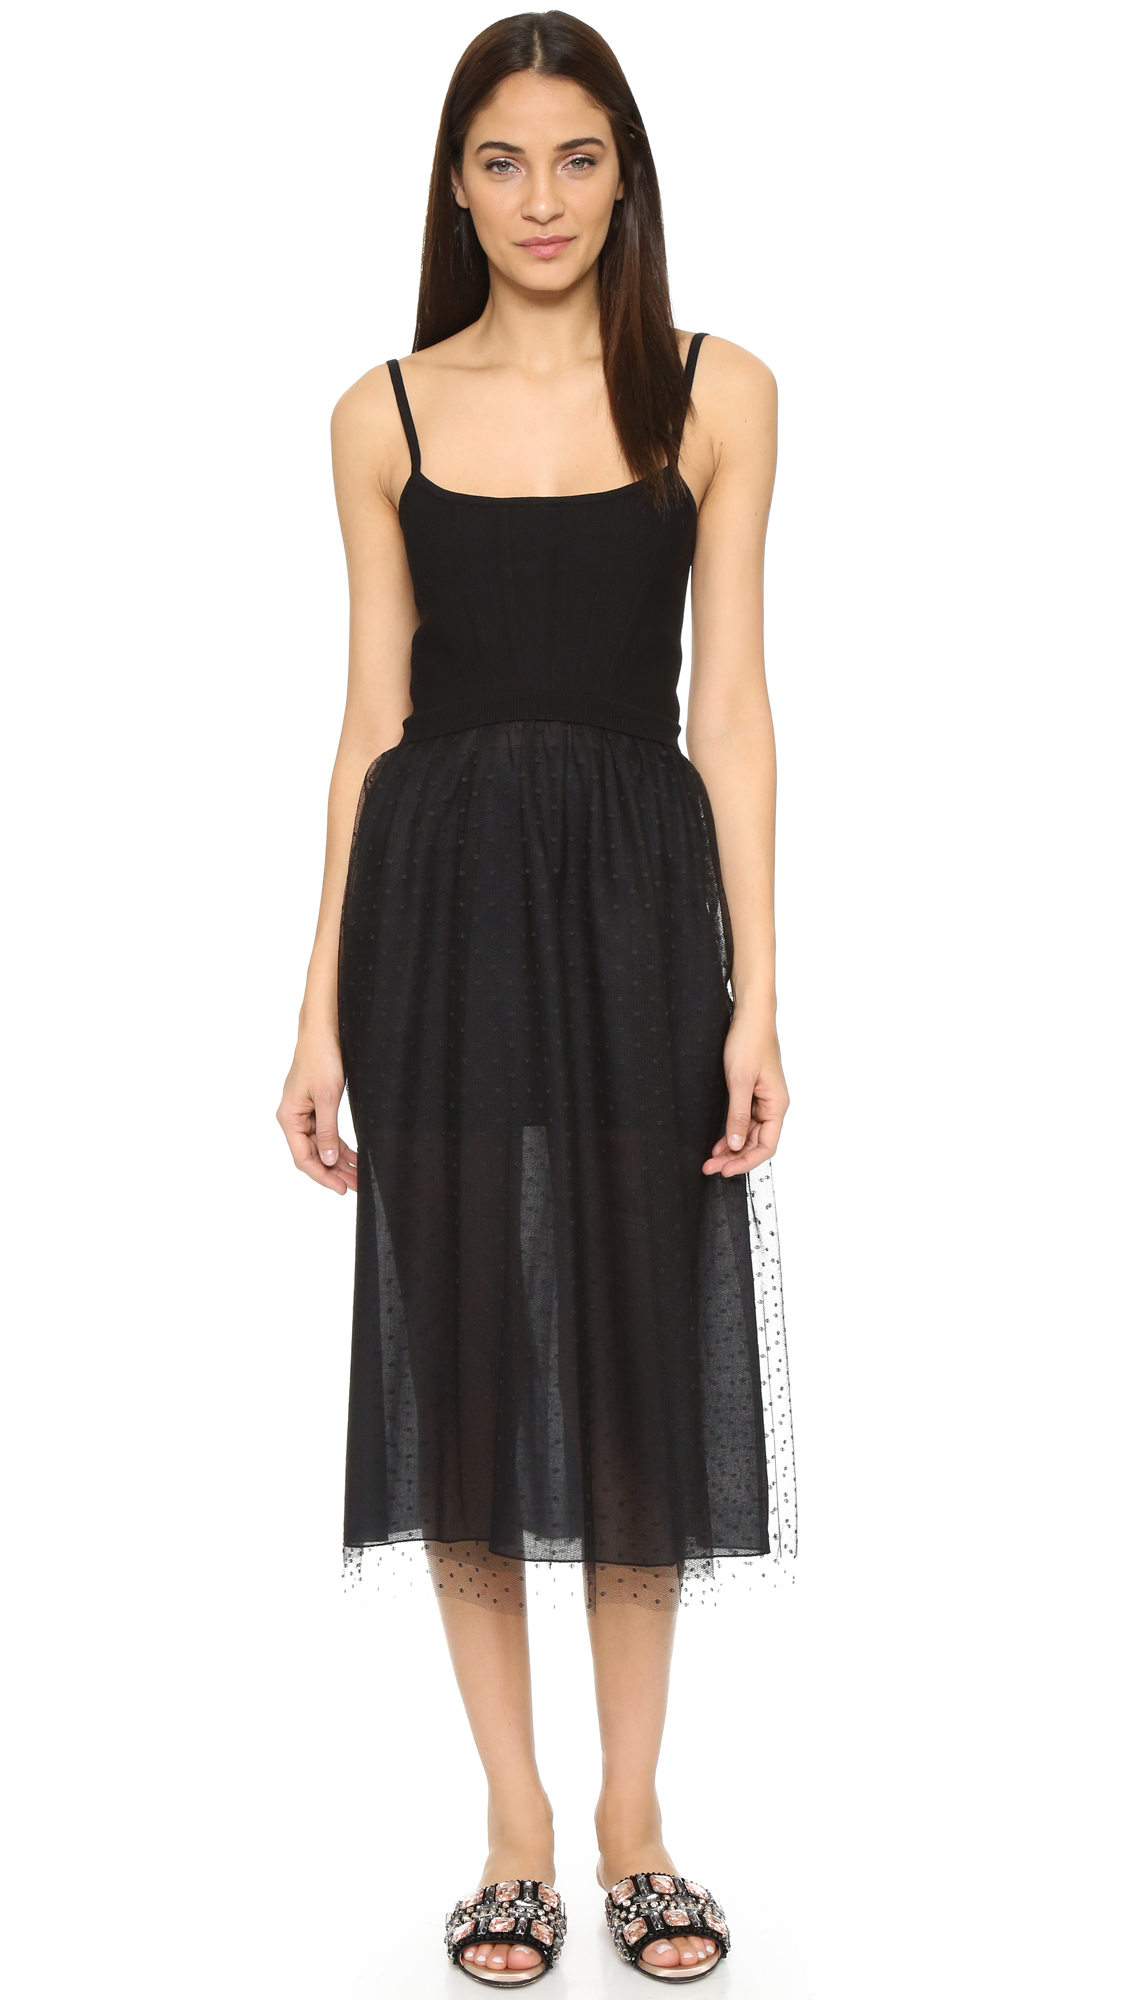 Formidable Red Valentino Black Tea Length Dress Black Product 1 353377313 Normal Tea Length Dresses Prom Tea Length Dresses Amazon wedding dress Tea Length Dresses